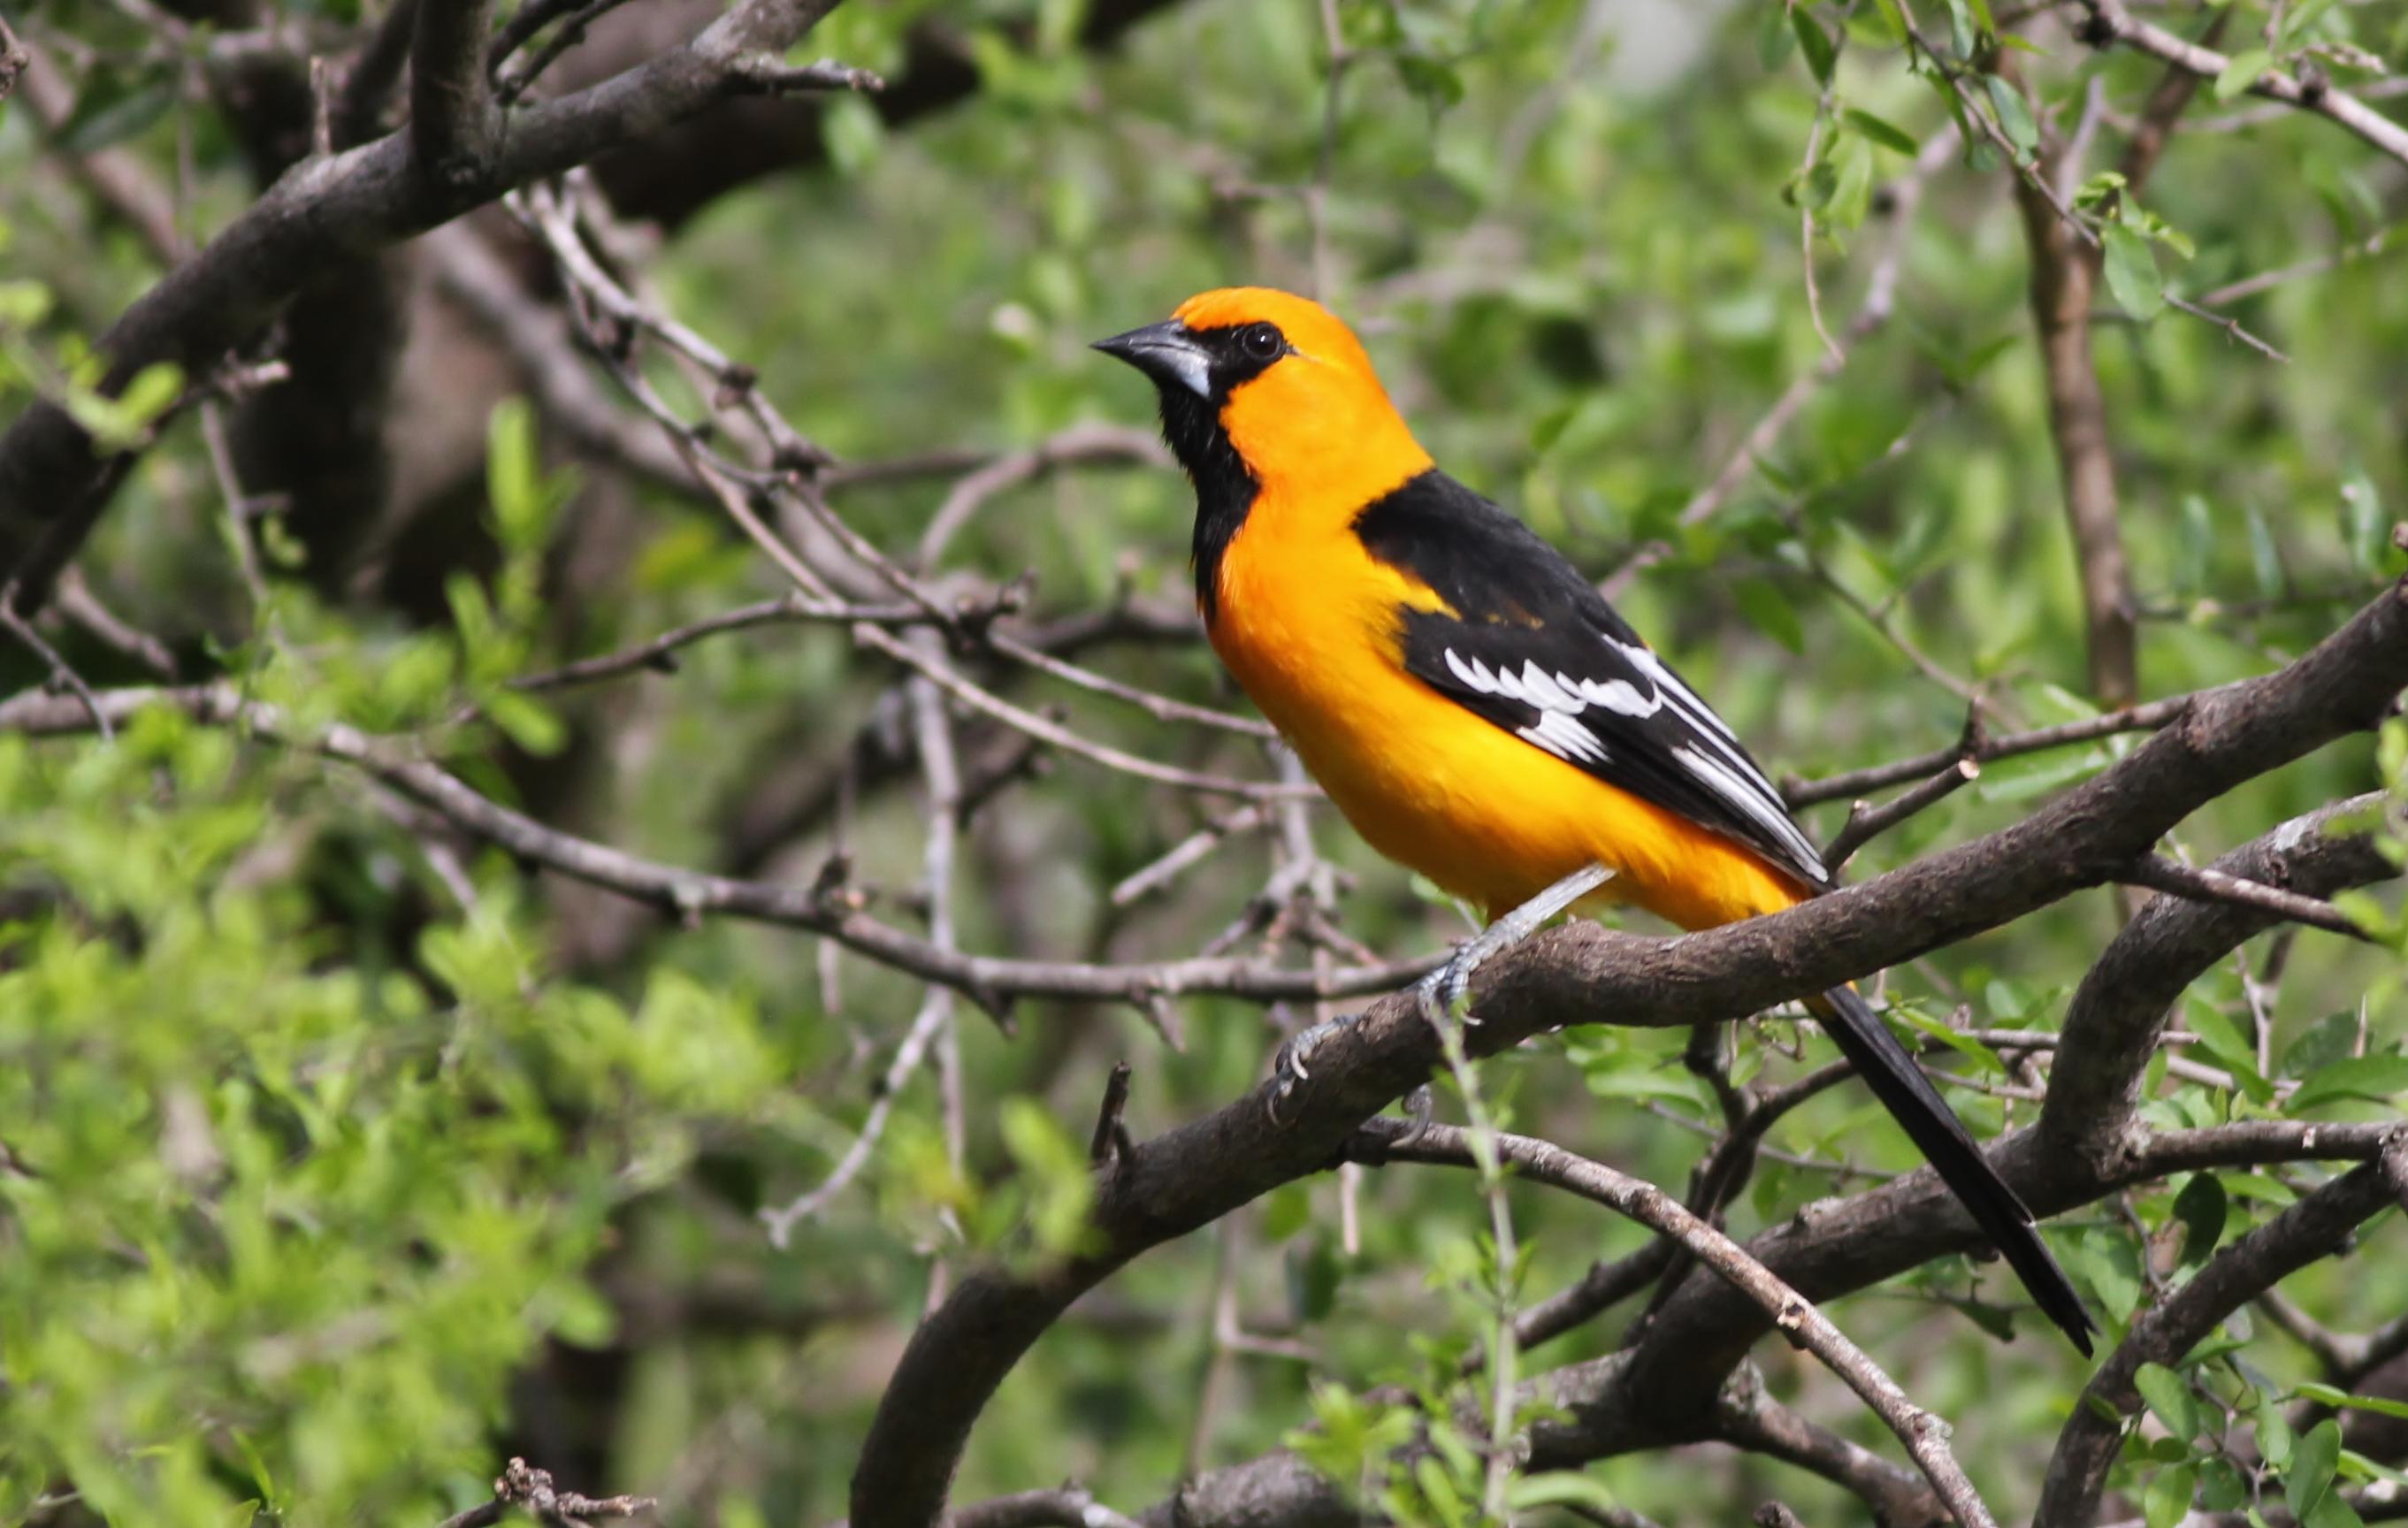 experience spring migration in south texas with nemesis bird tours rh nemesisbird com